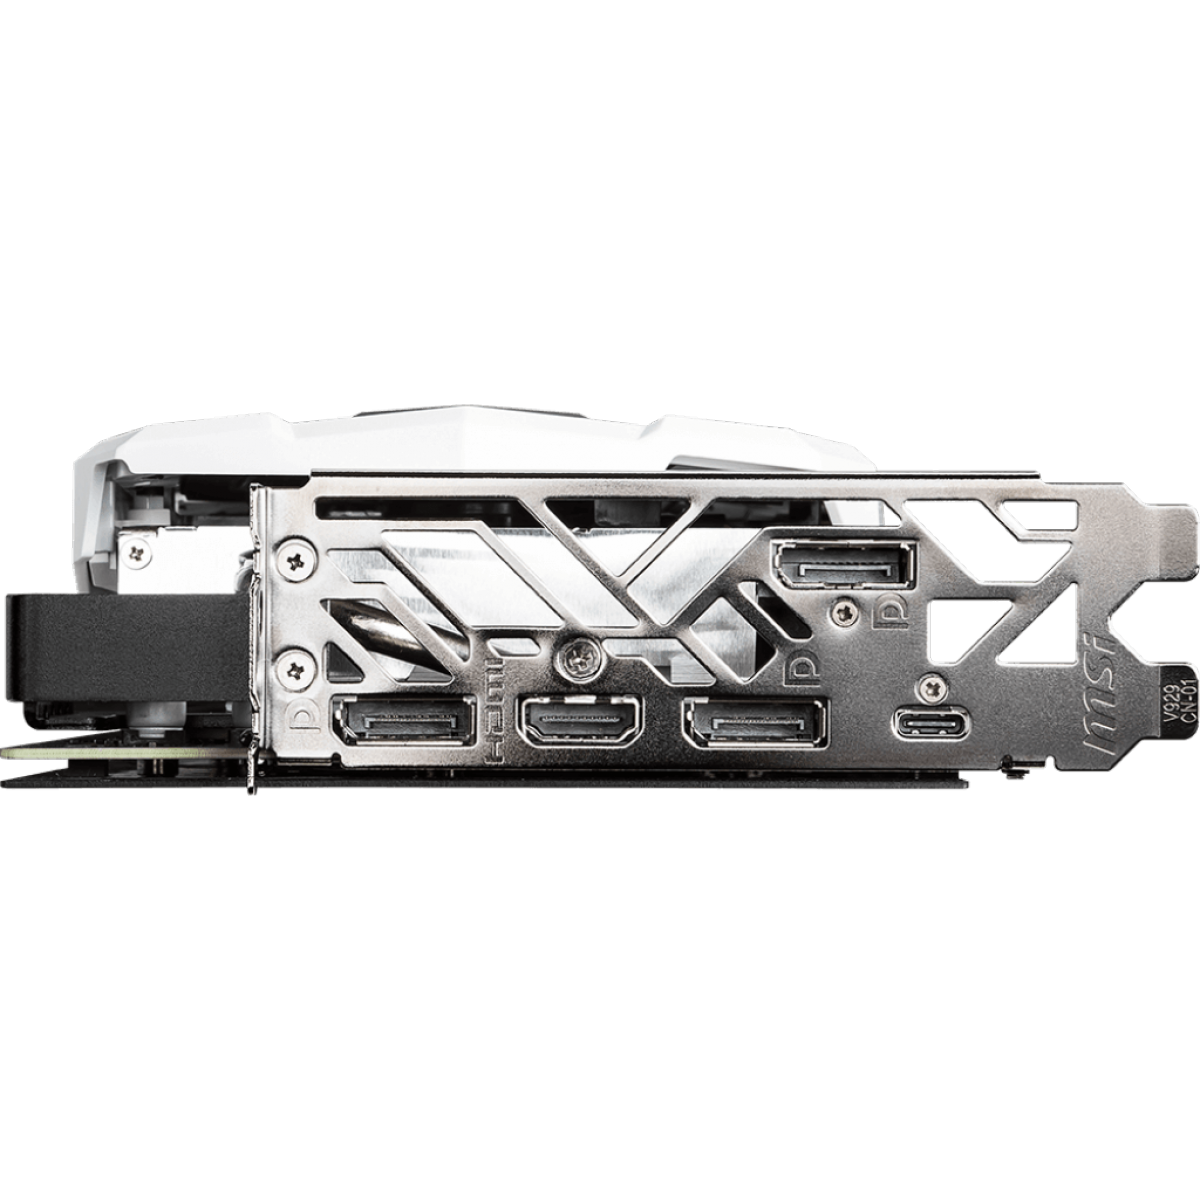 Placa de Video MSI GeForce RTX 2070 ARMOR 8G Dual, 8GB GDDR6, 256Bit